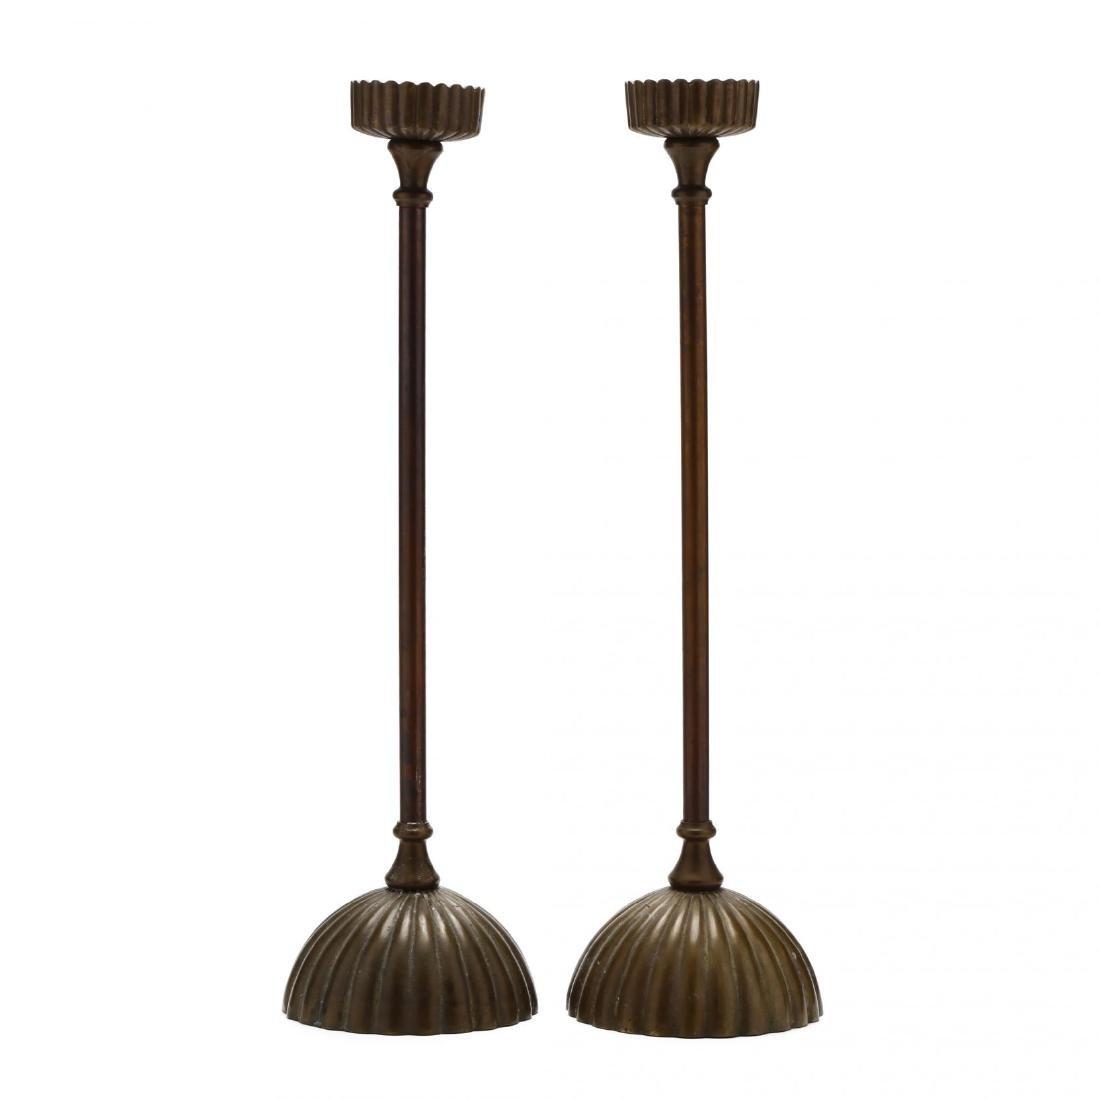 Silvestri, Pair of Modernist Brass Pricket Sticks